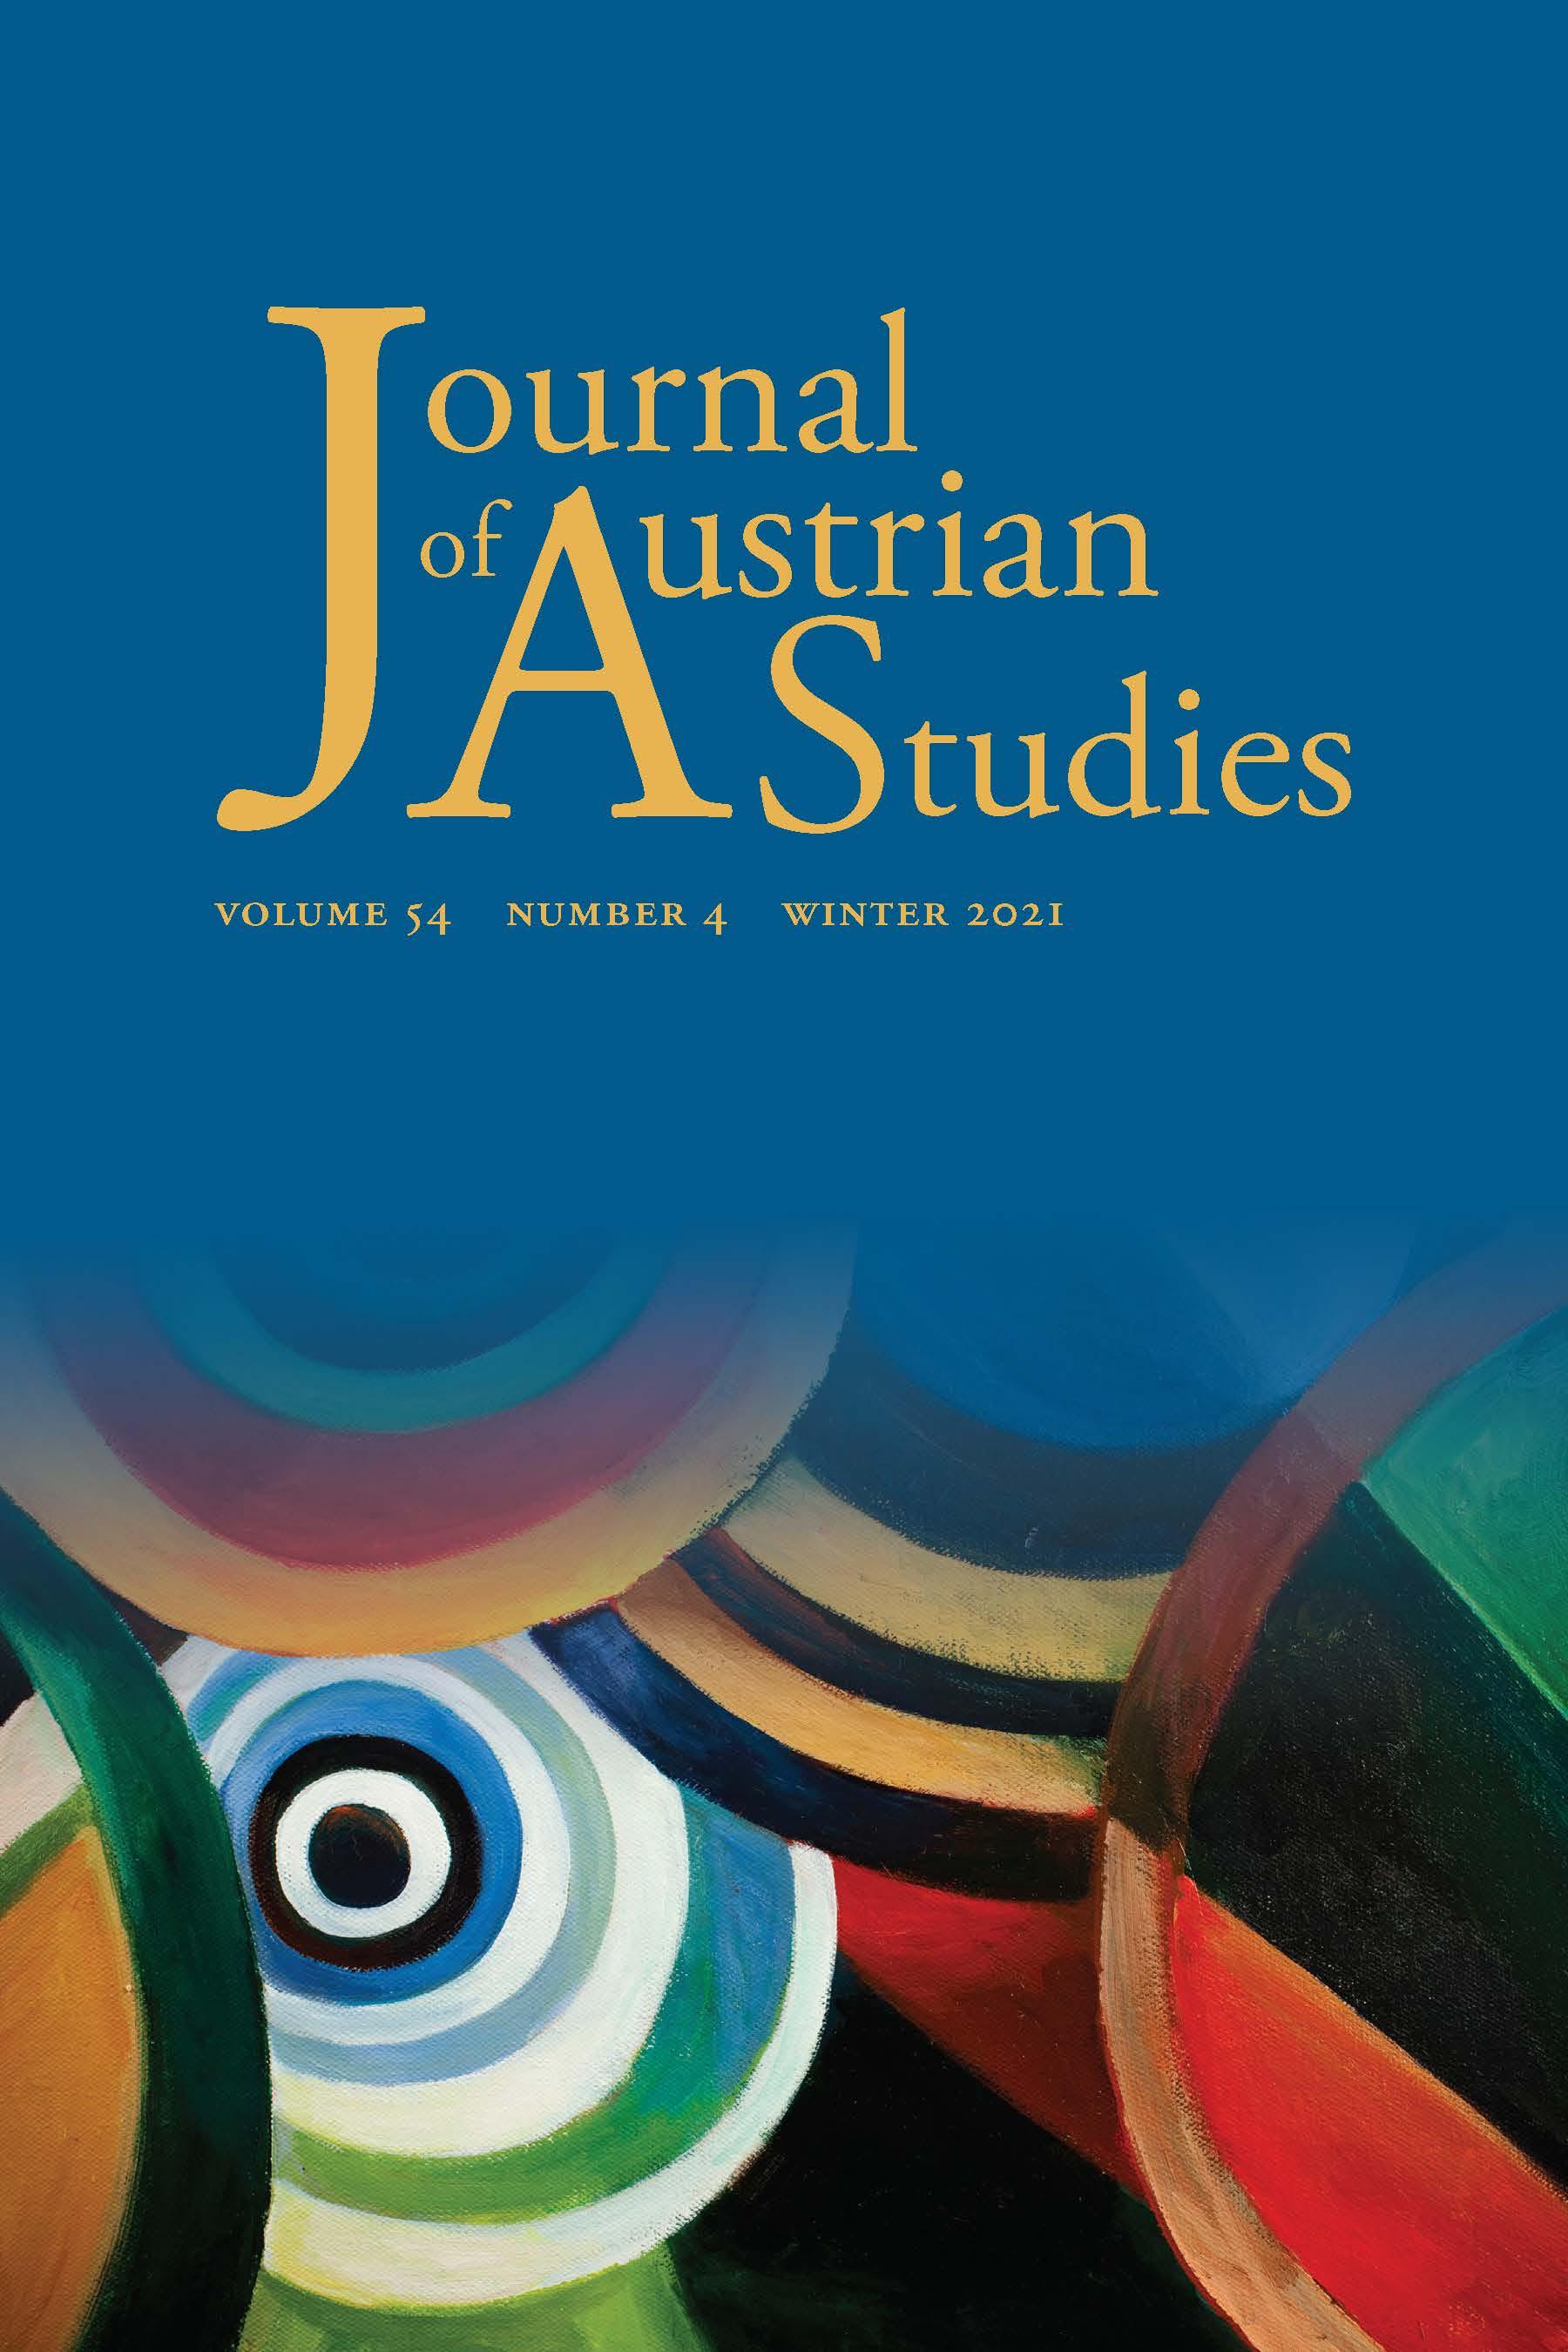 Journal of Austrian Studies: Volume 54, Number 4, Winter 2021